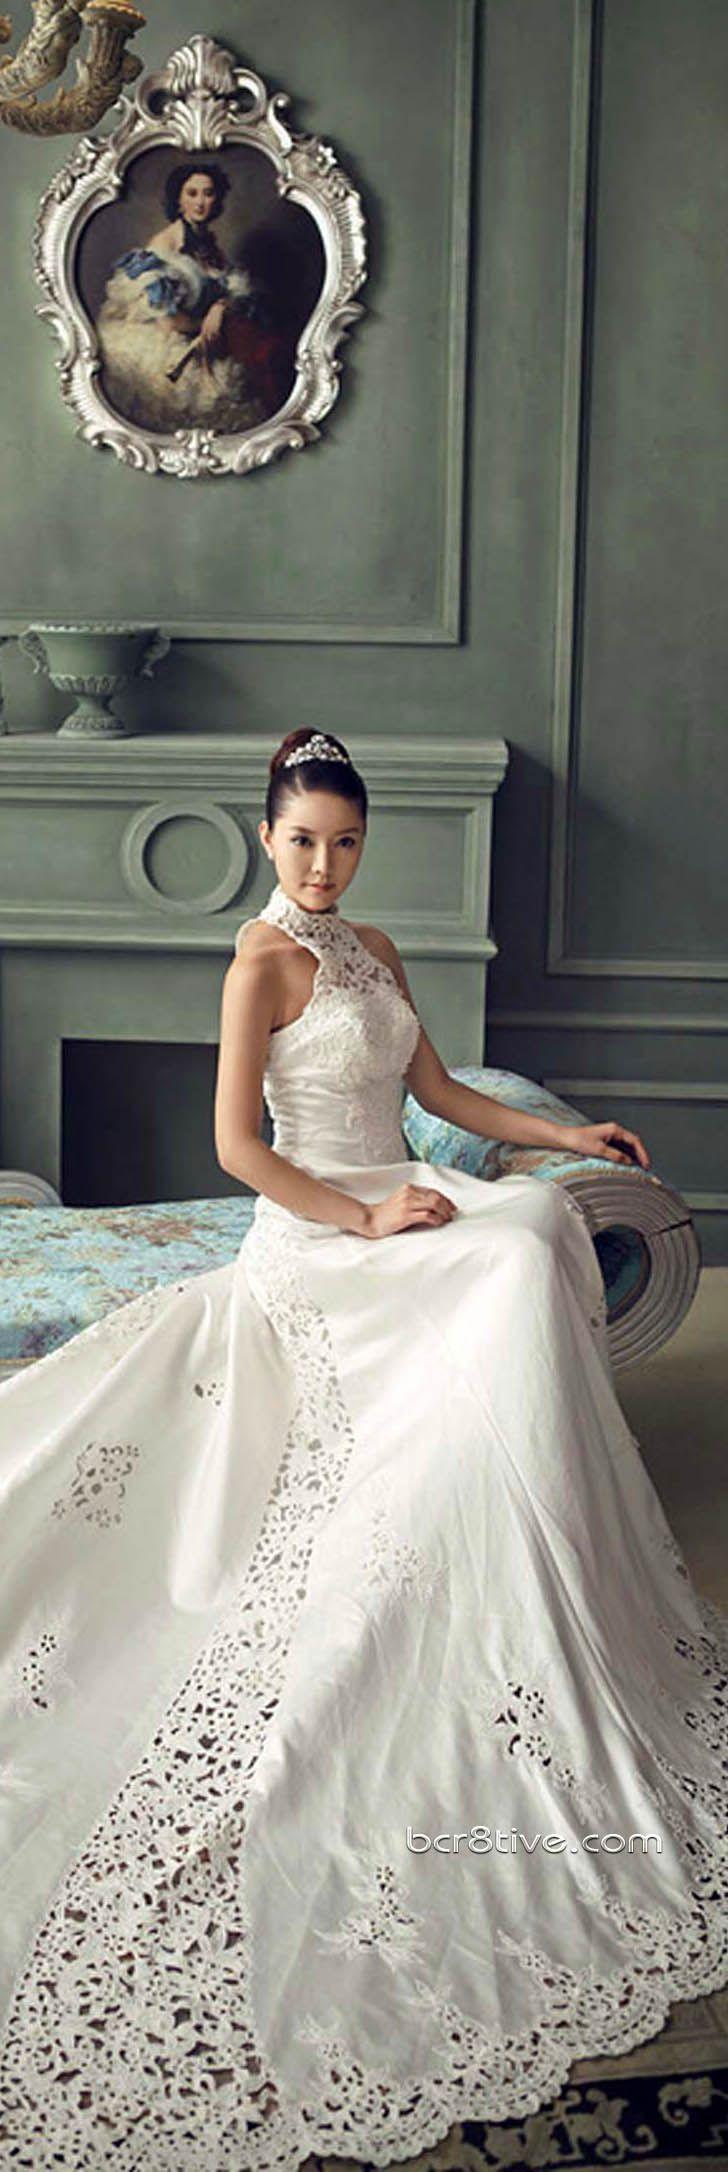 Fashion Editorial Photos of Model, Miranda Zhao Yu Fei #bridal #gown